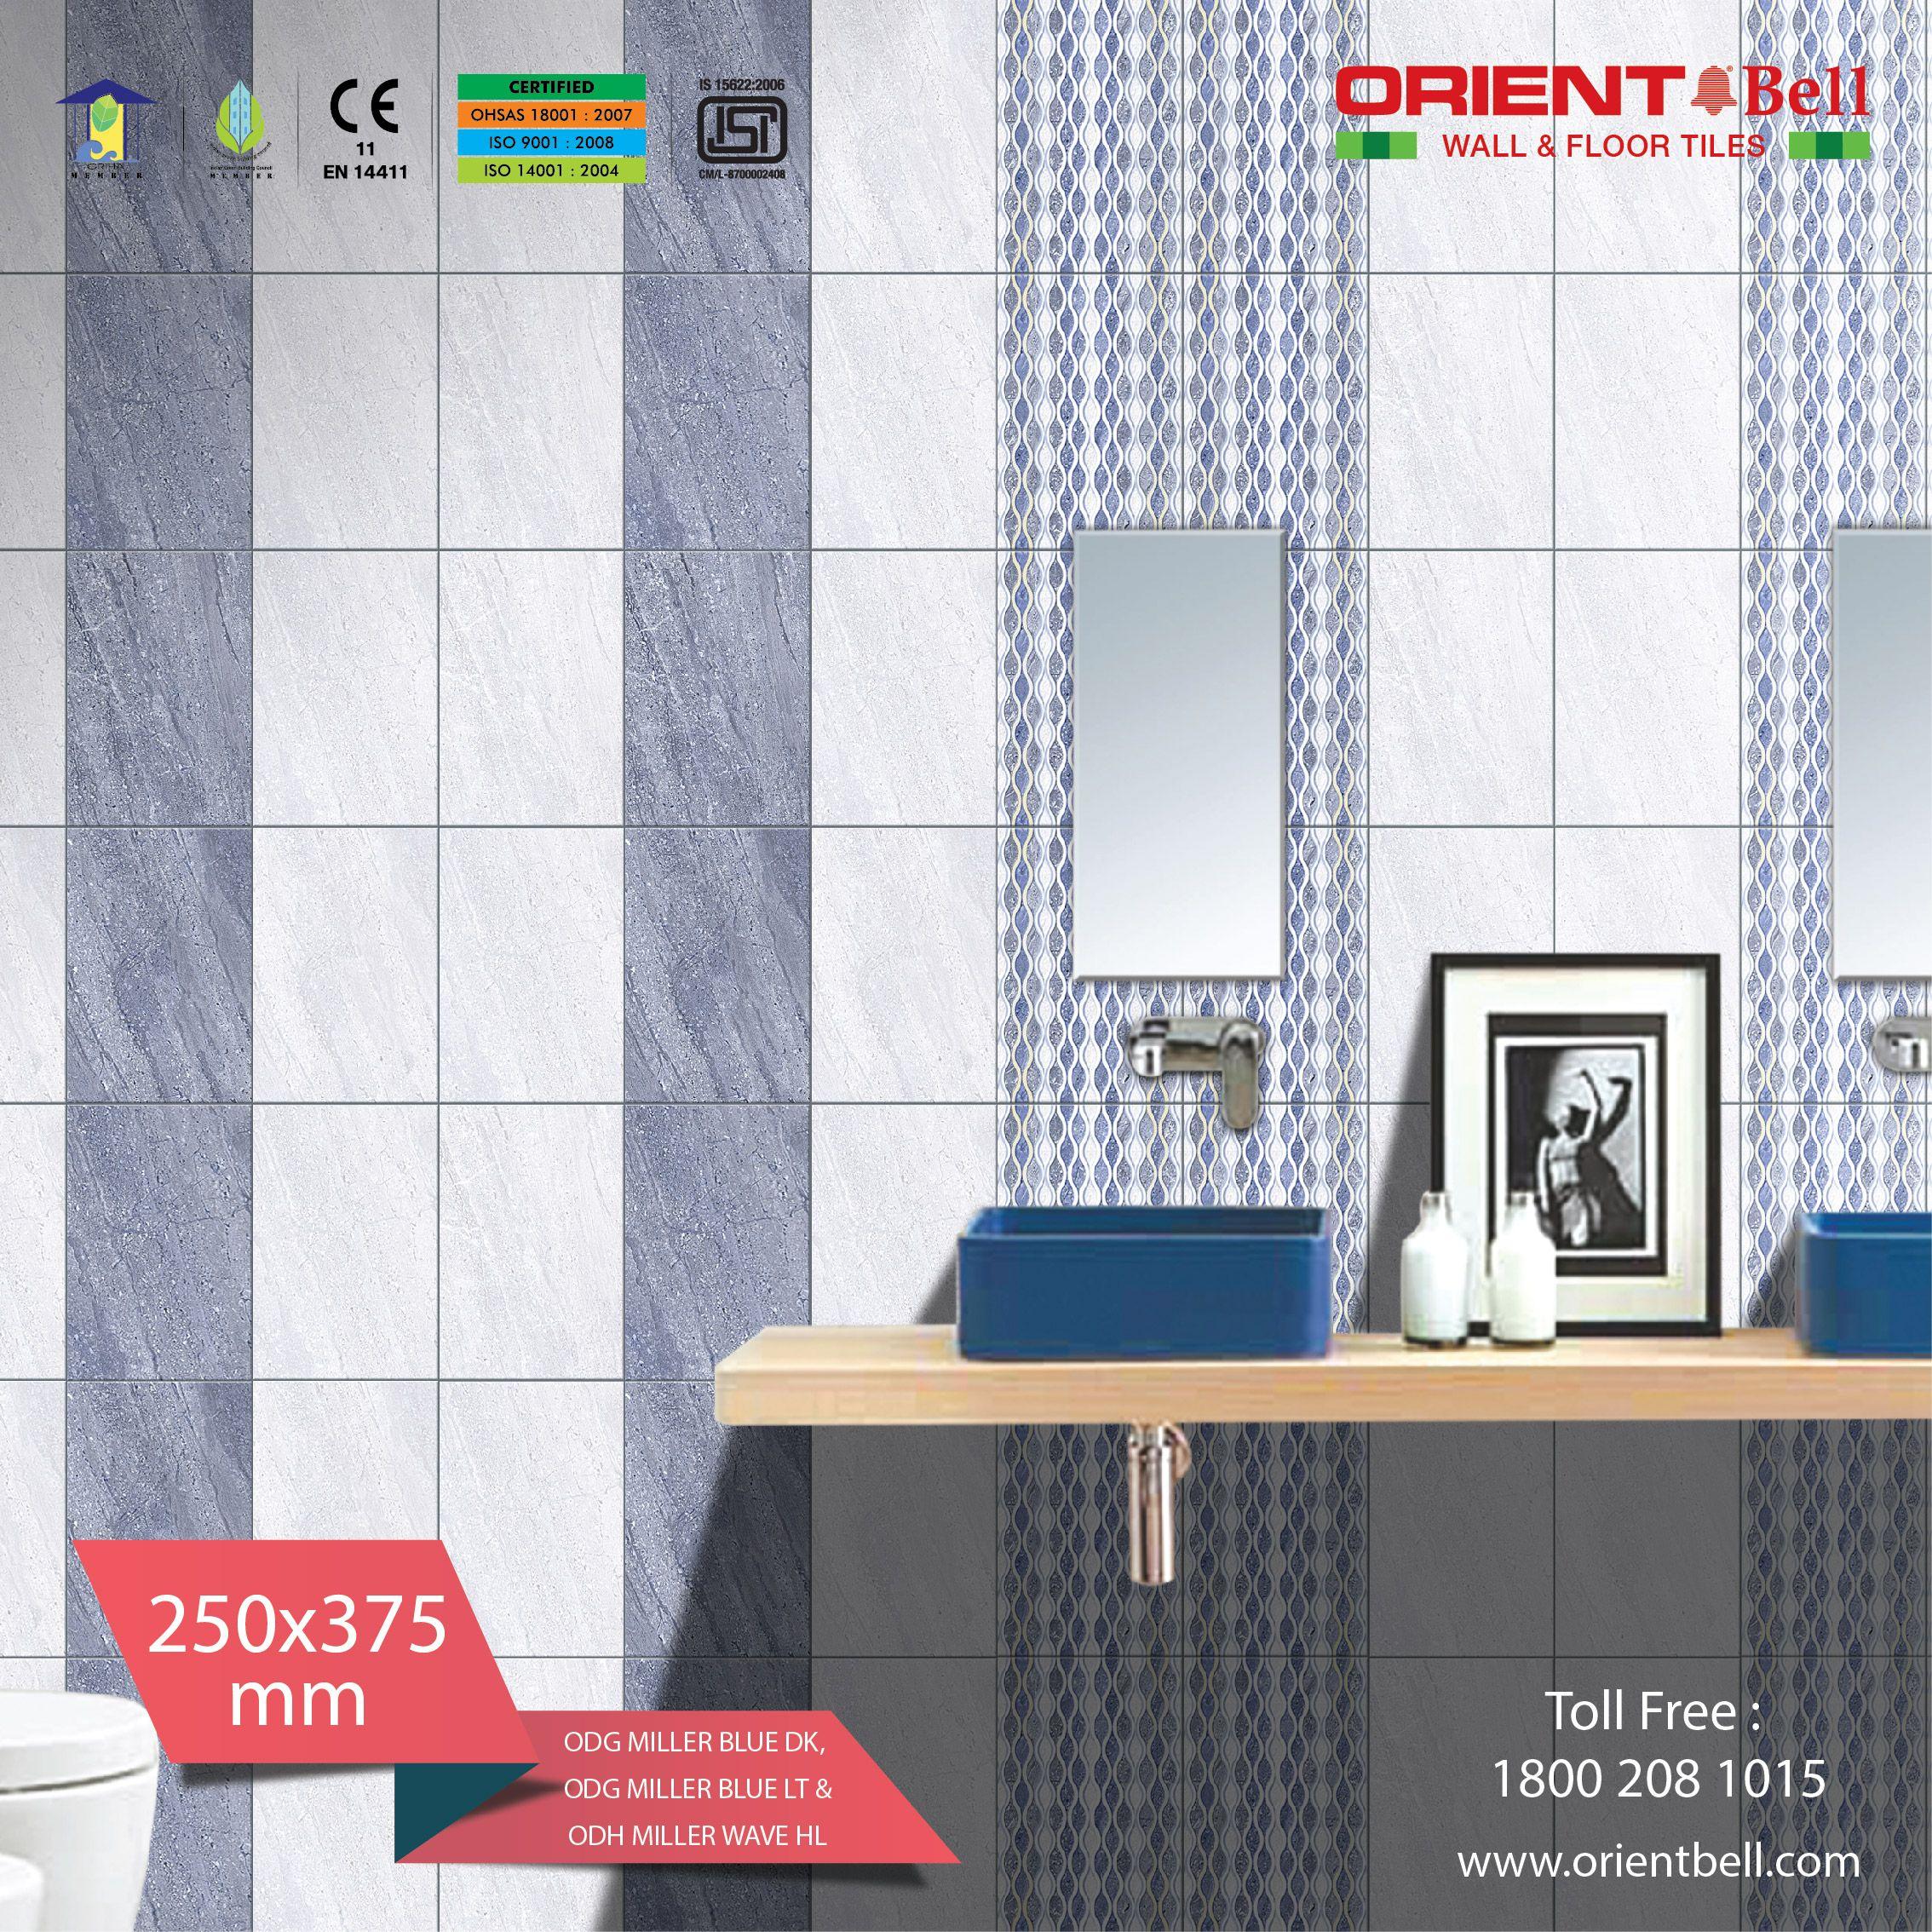 Pin By Orientbell Tiles On Digital Tiles Tiles Digital Wall Tile